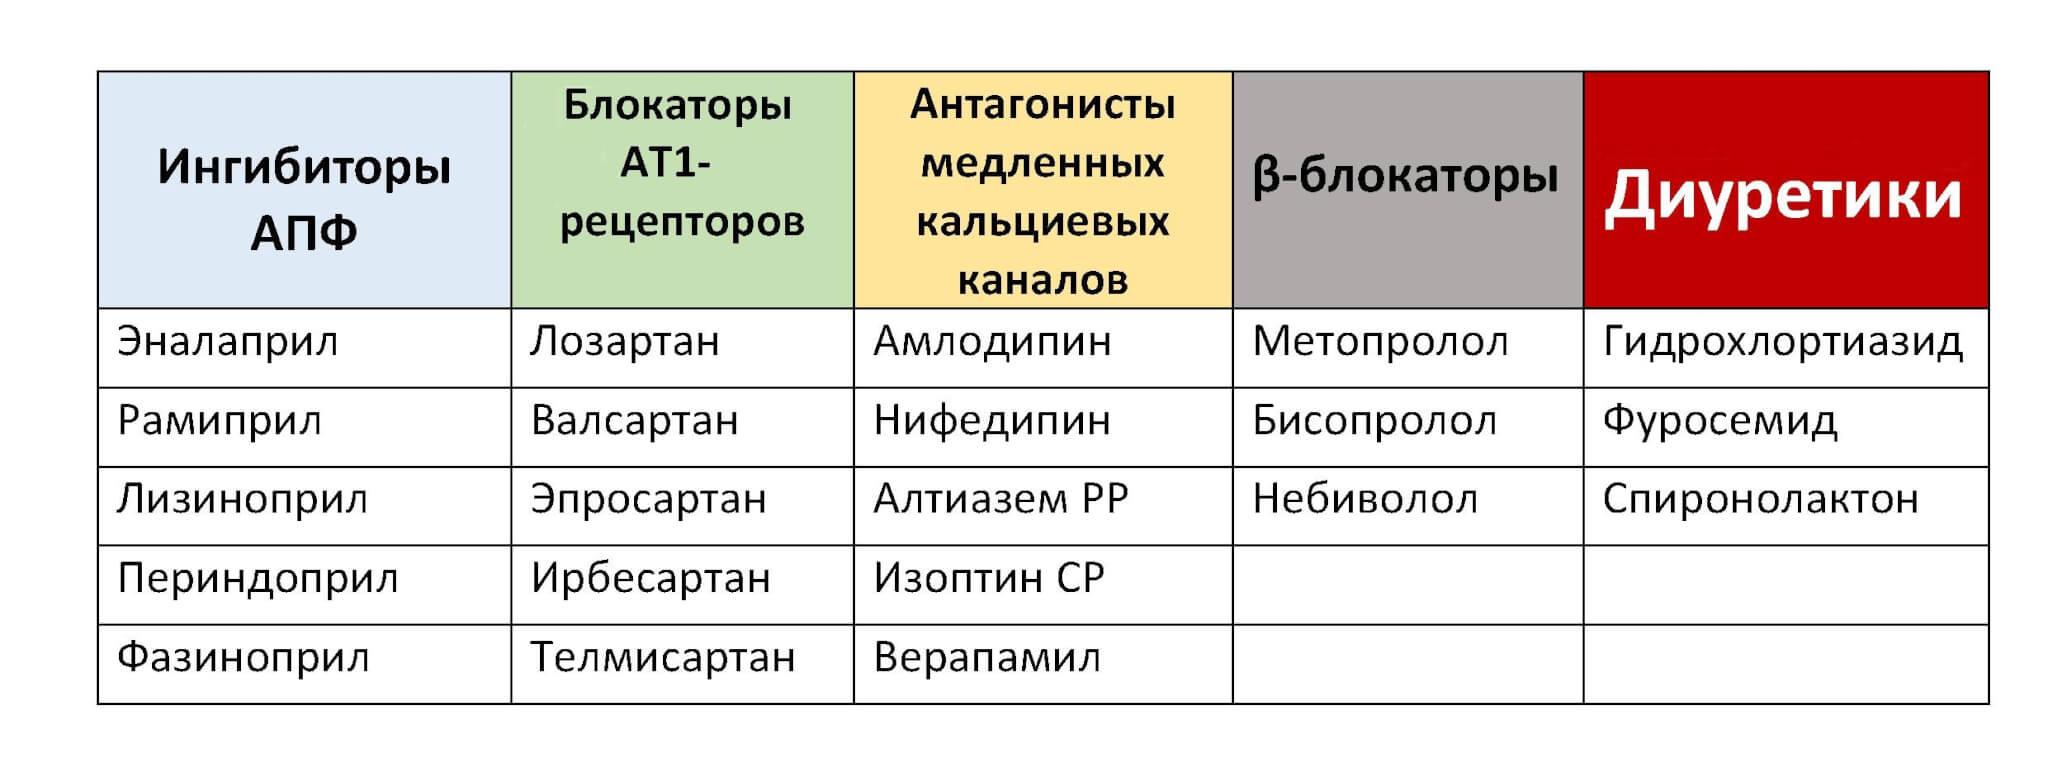 hipertenzija vyrams narkotikai)